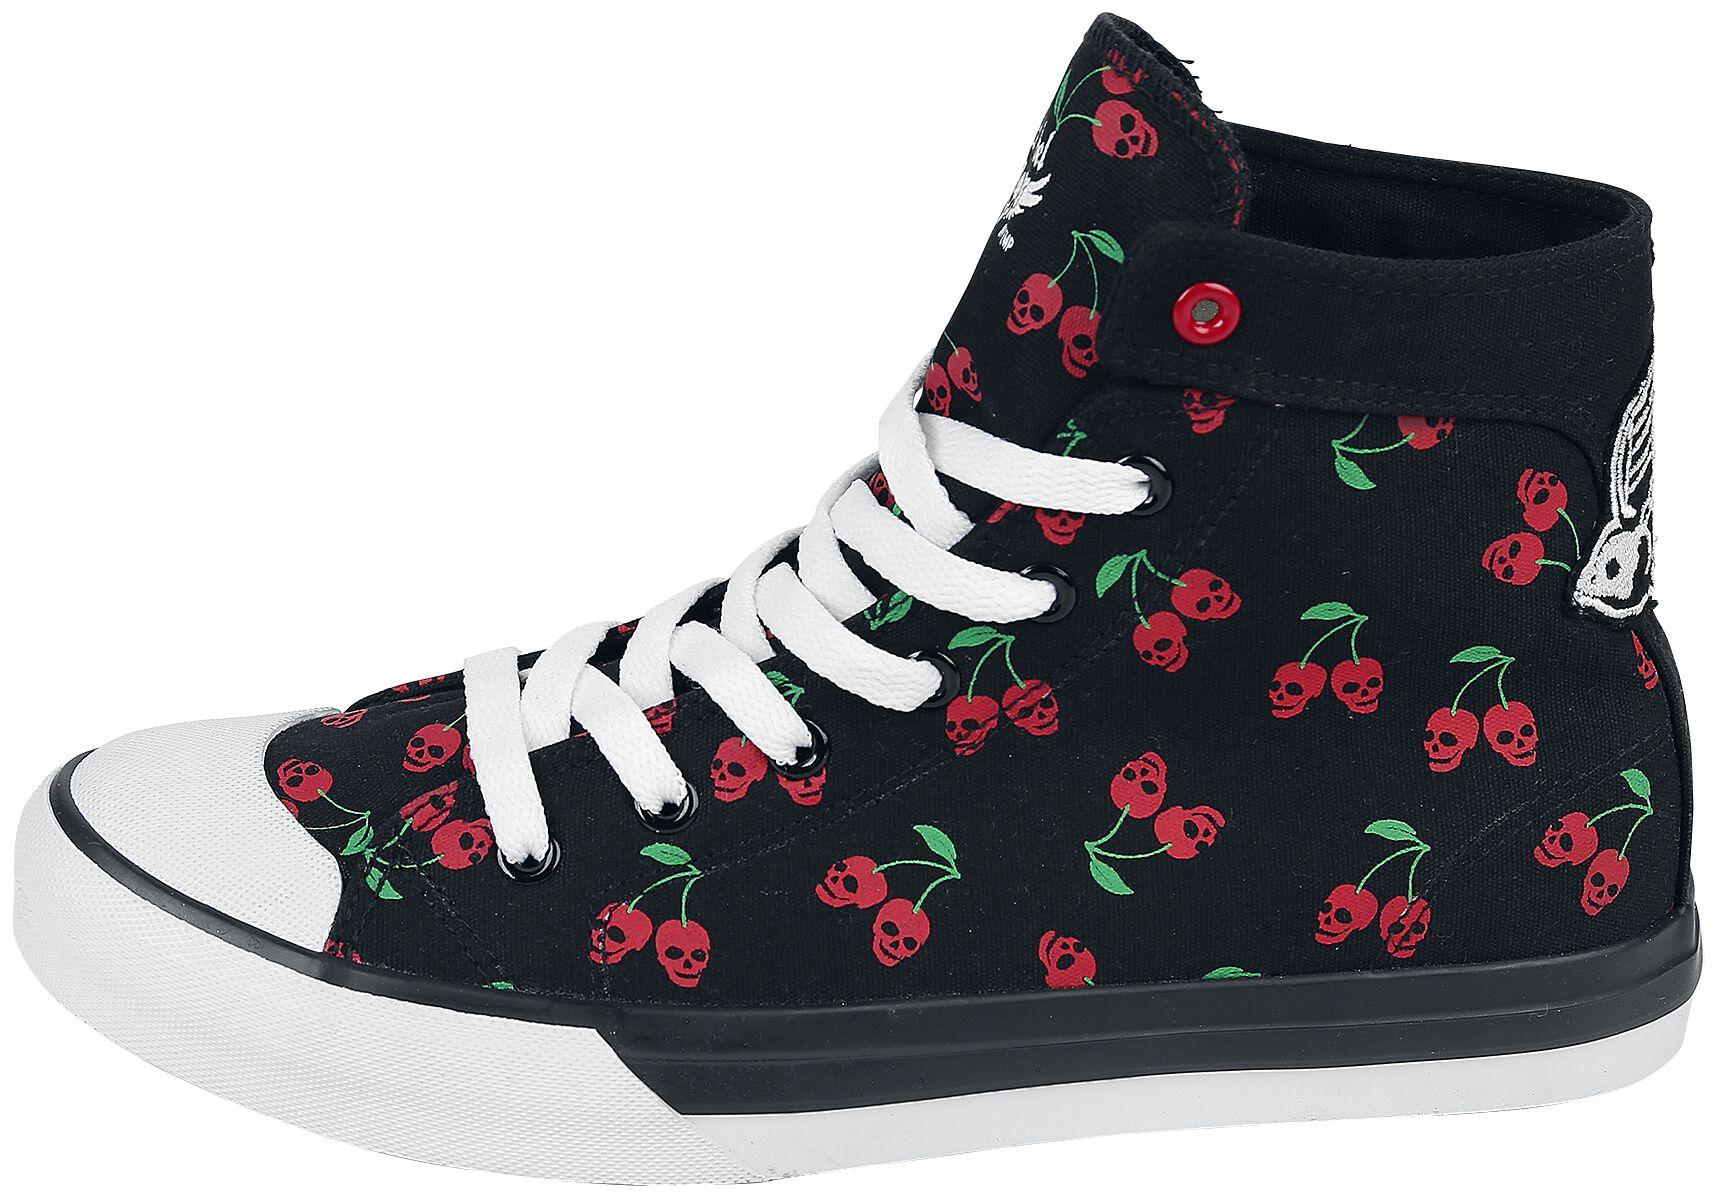 Walk The Line | Rock Rebel by EMP Sneakers High | EMP